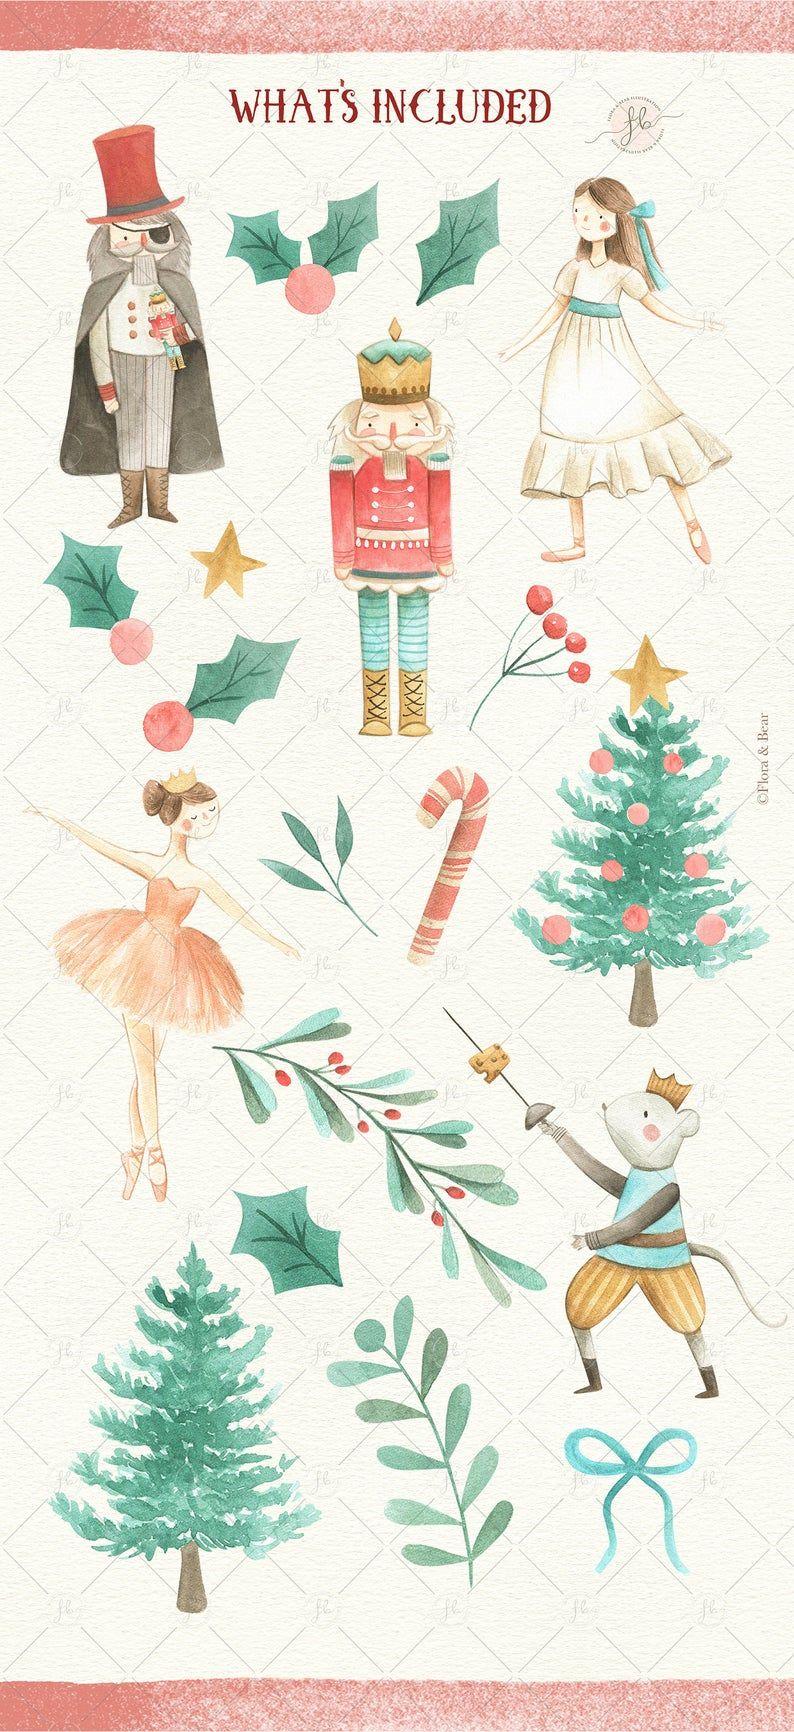 Watercolor Nutcracker Clipart Christmas Tree Clip art Ballerina Winter Onederland Invitation Winter Soldier